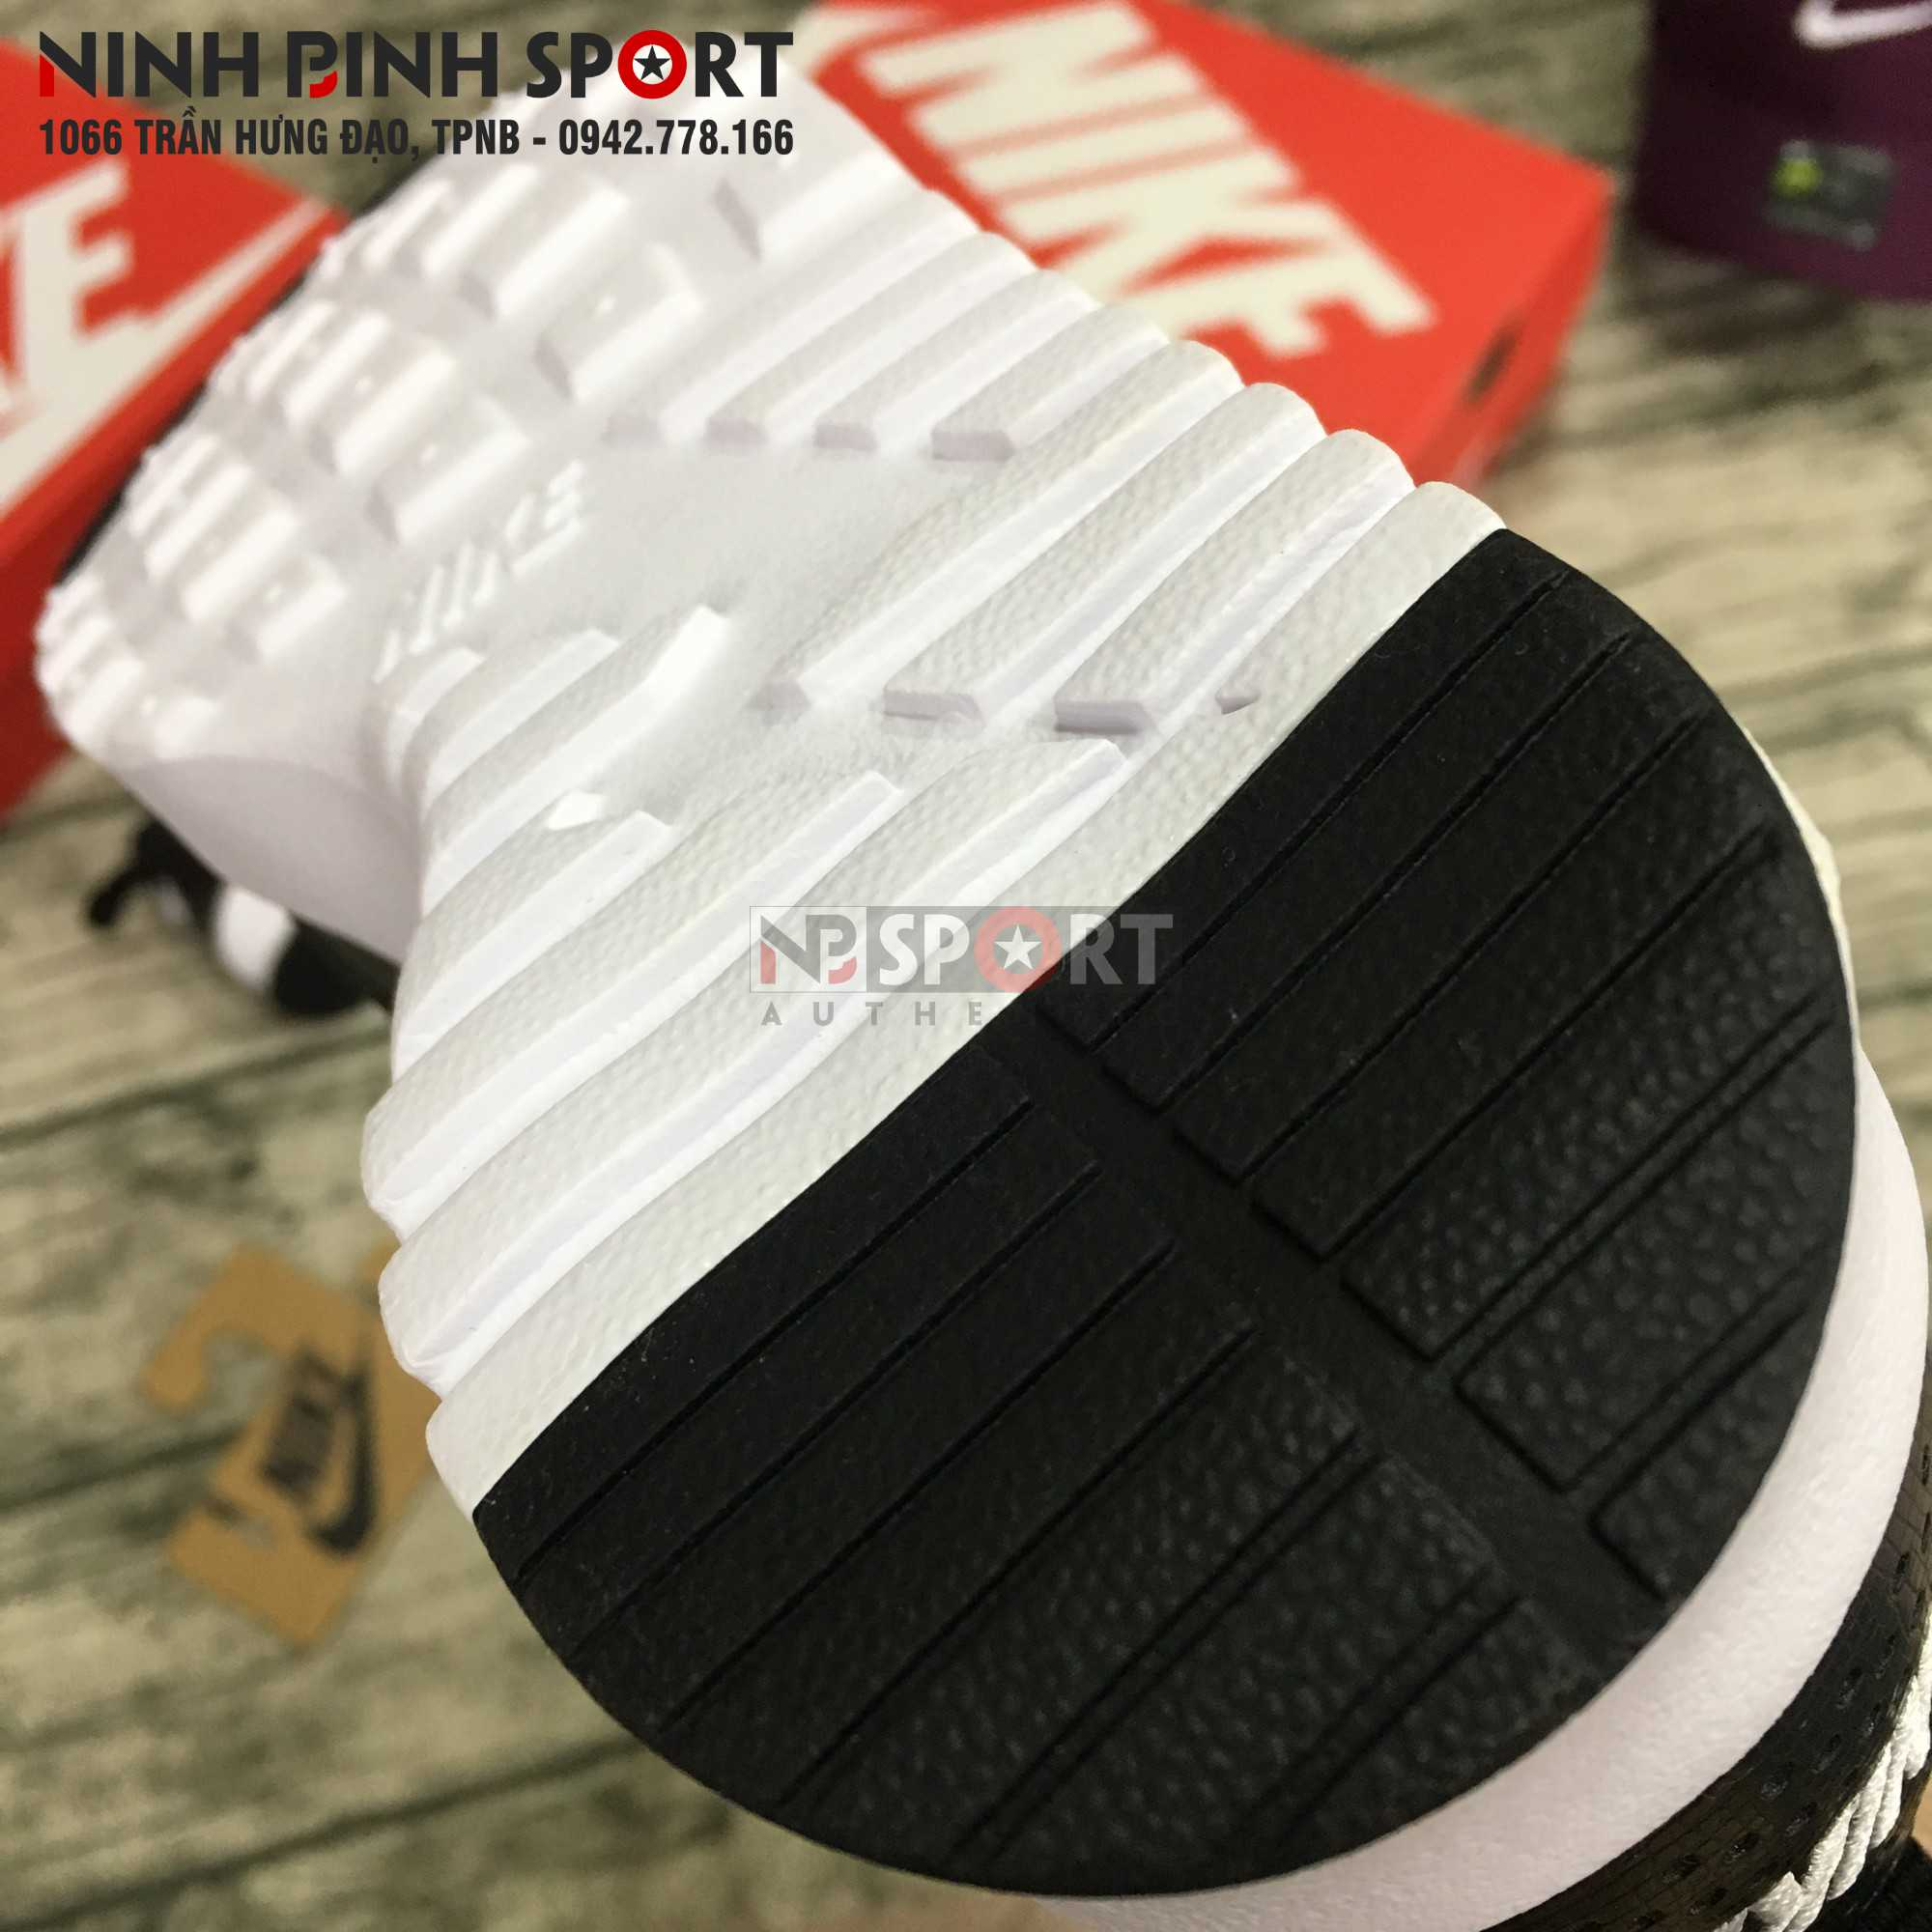 Giày thể thao nữ Nike Wmns Air Max Thea 599409-028